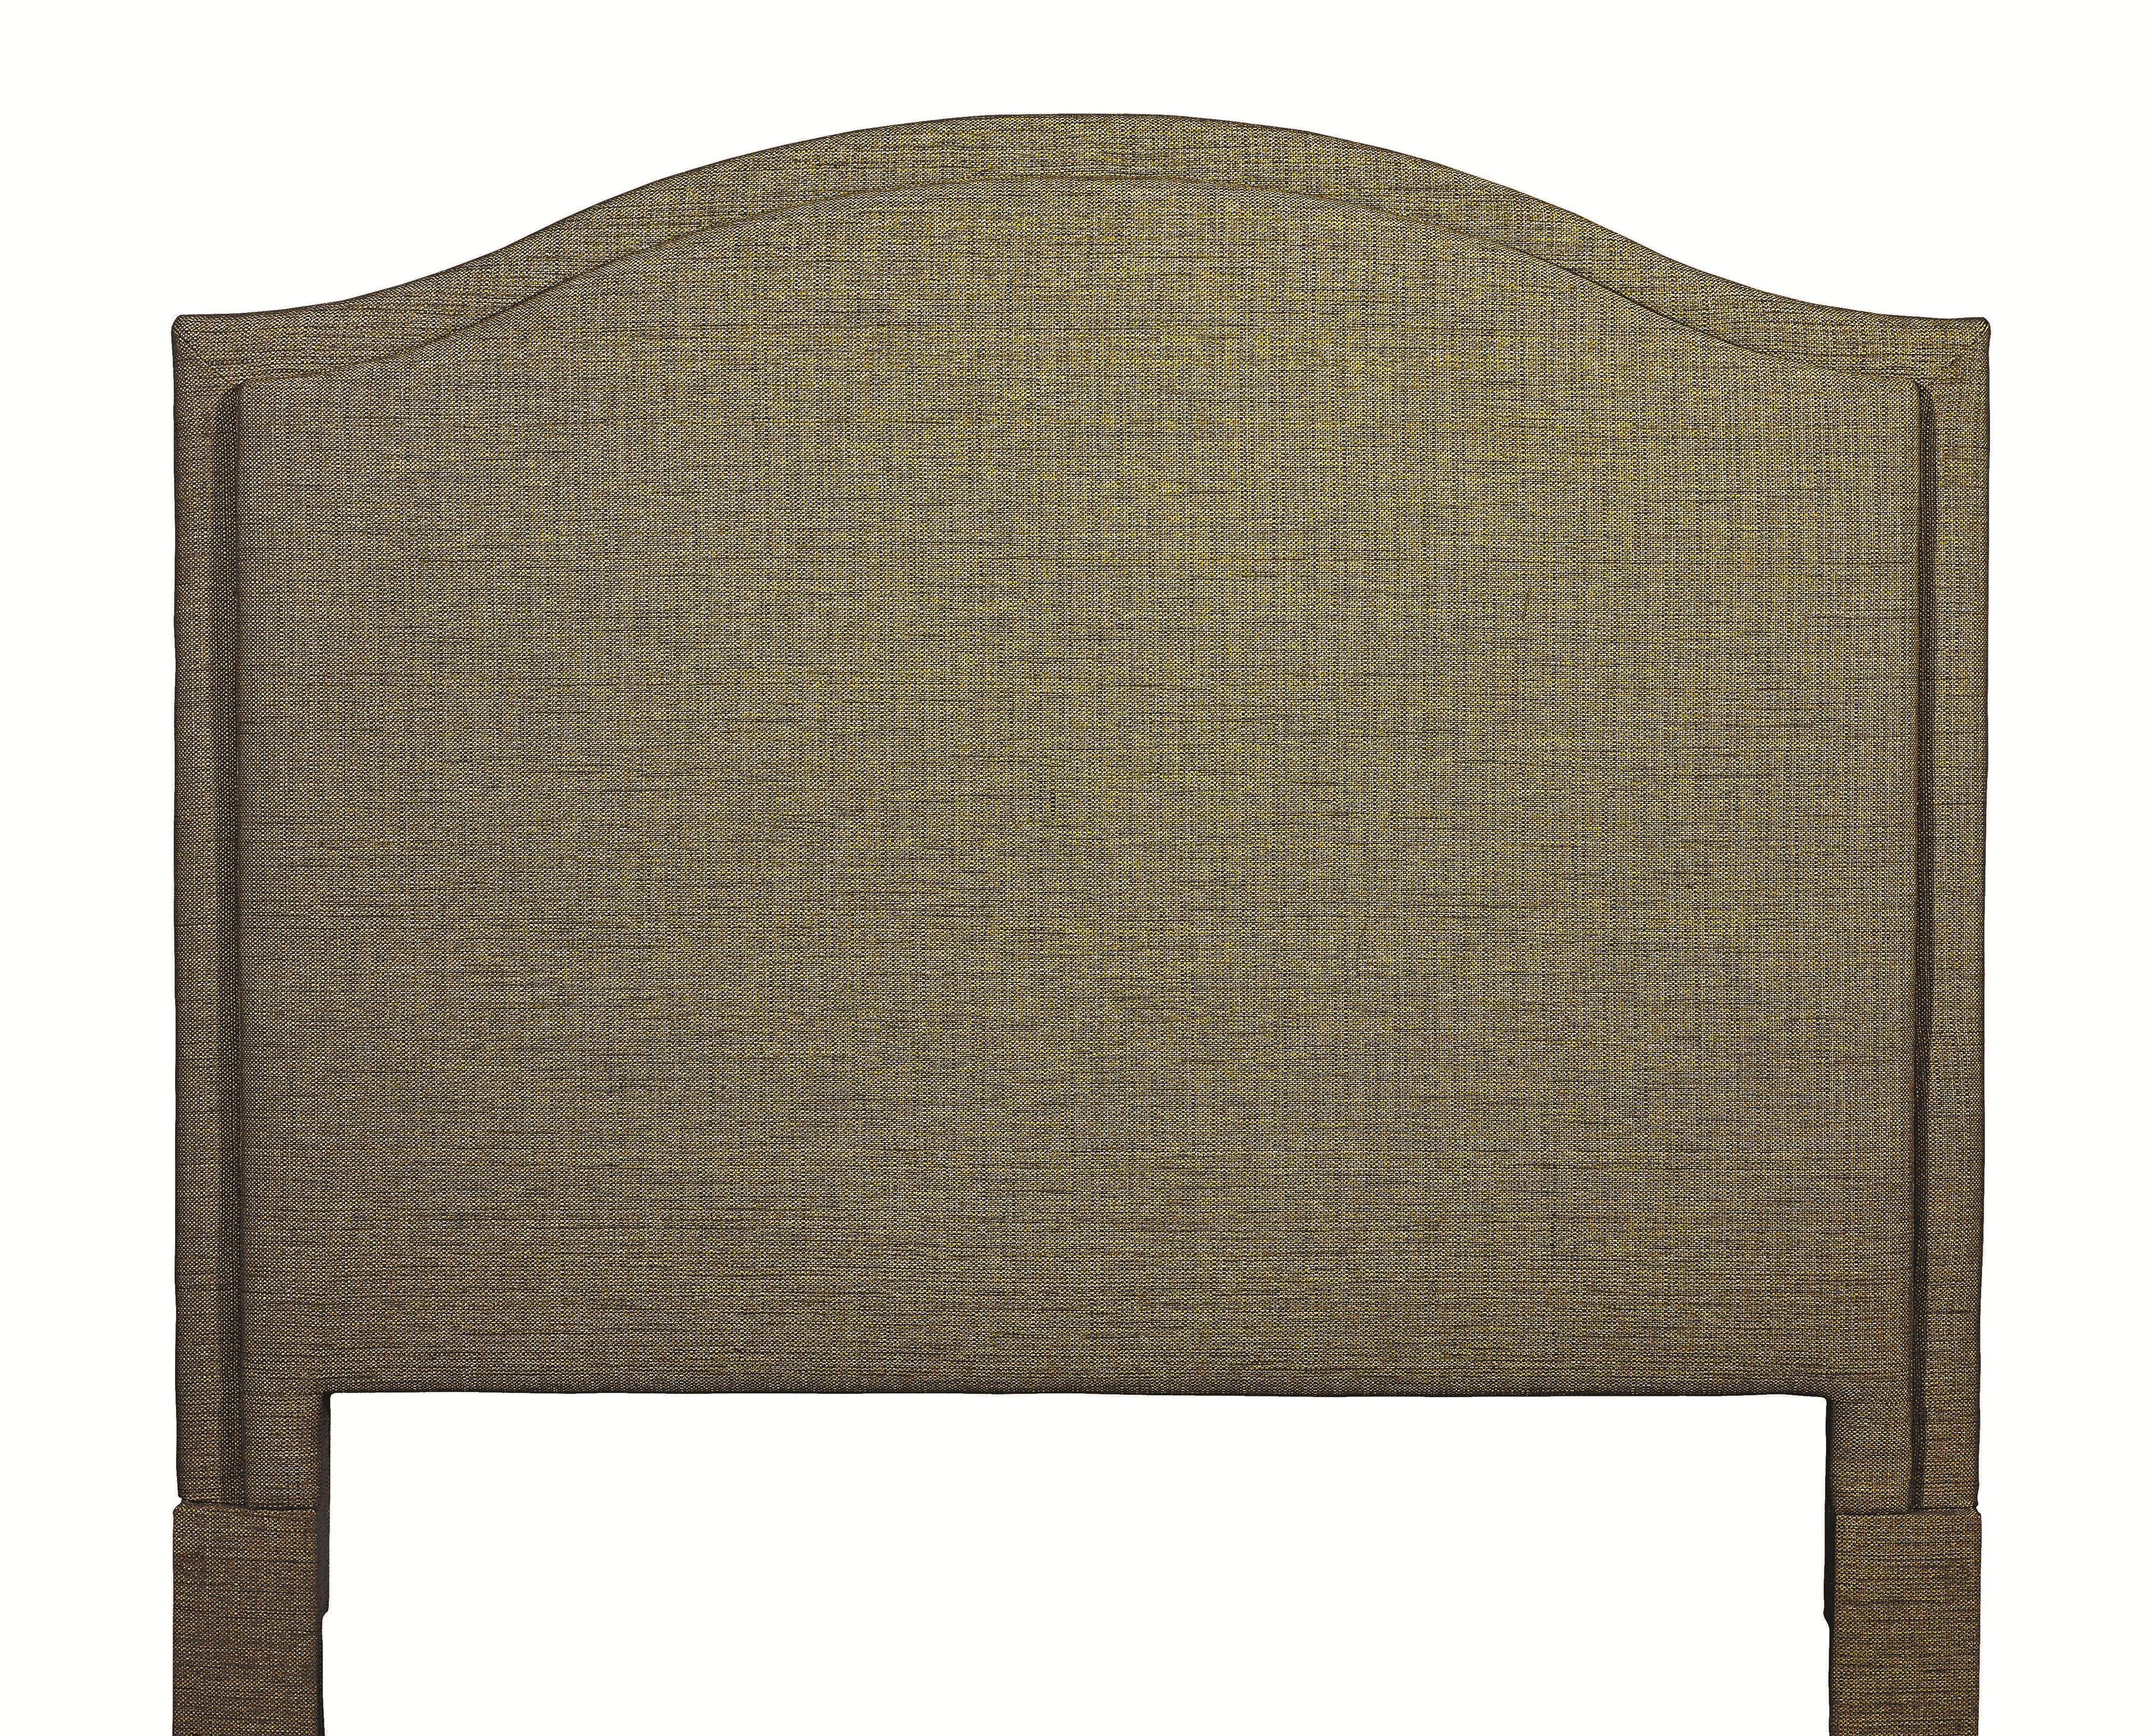 Bassett custom upholstered beds queen vienna upholstered headboard john v schultz furniture - Custom headboard ...